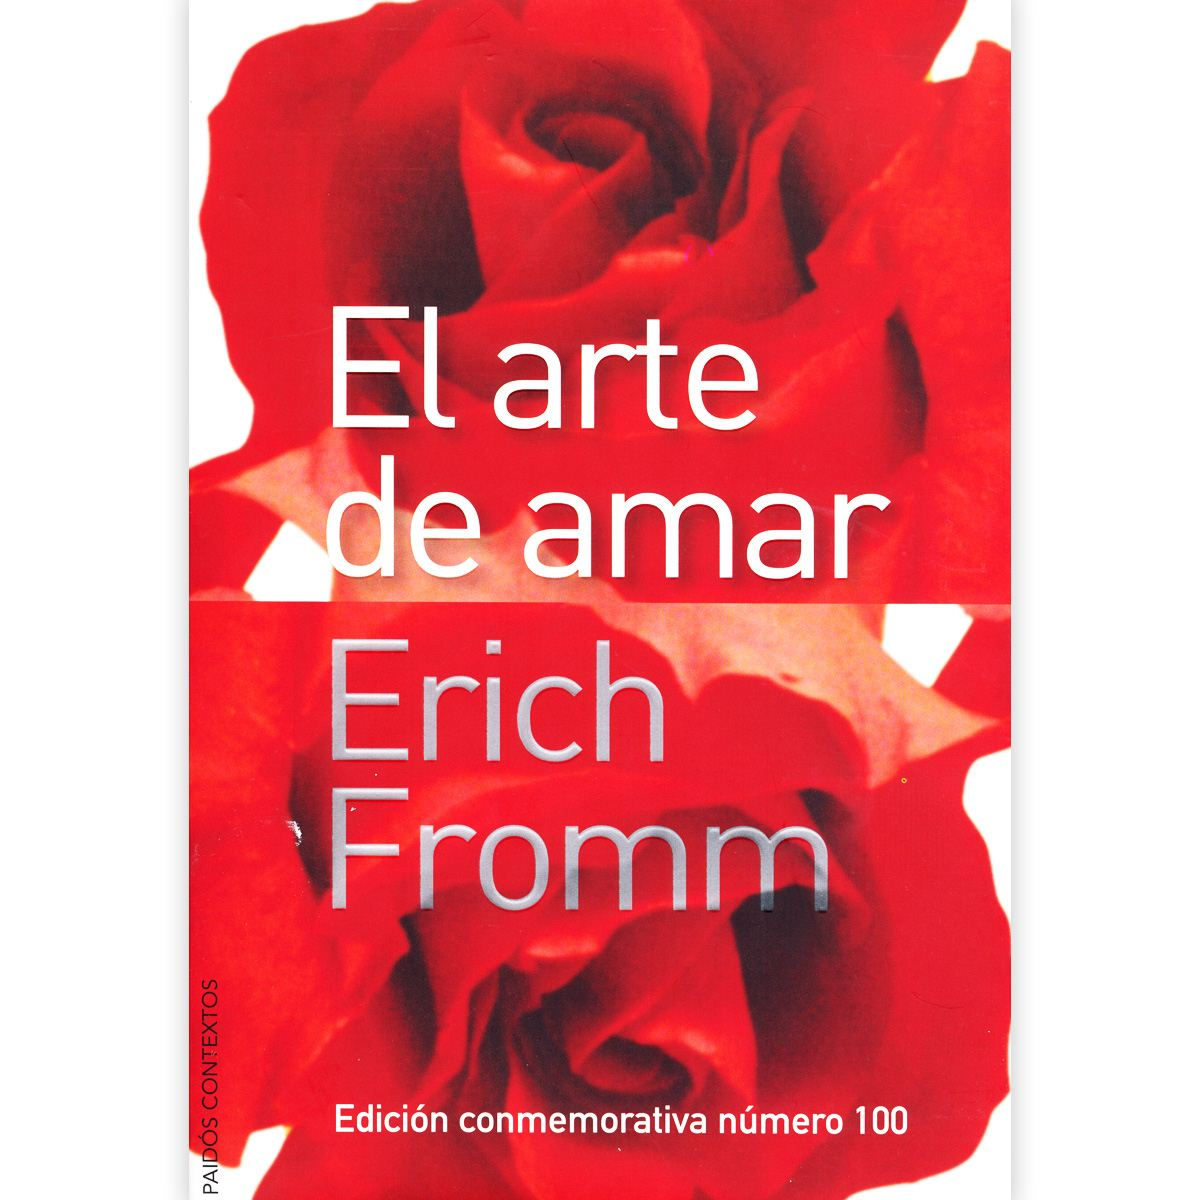 El arte de amar erich fromm 1956